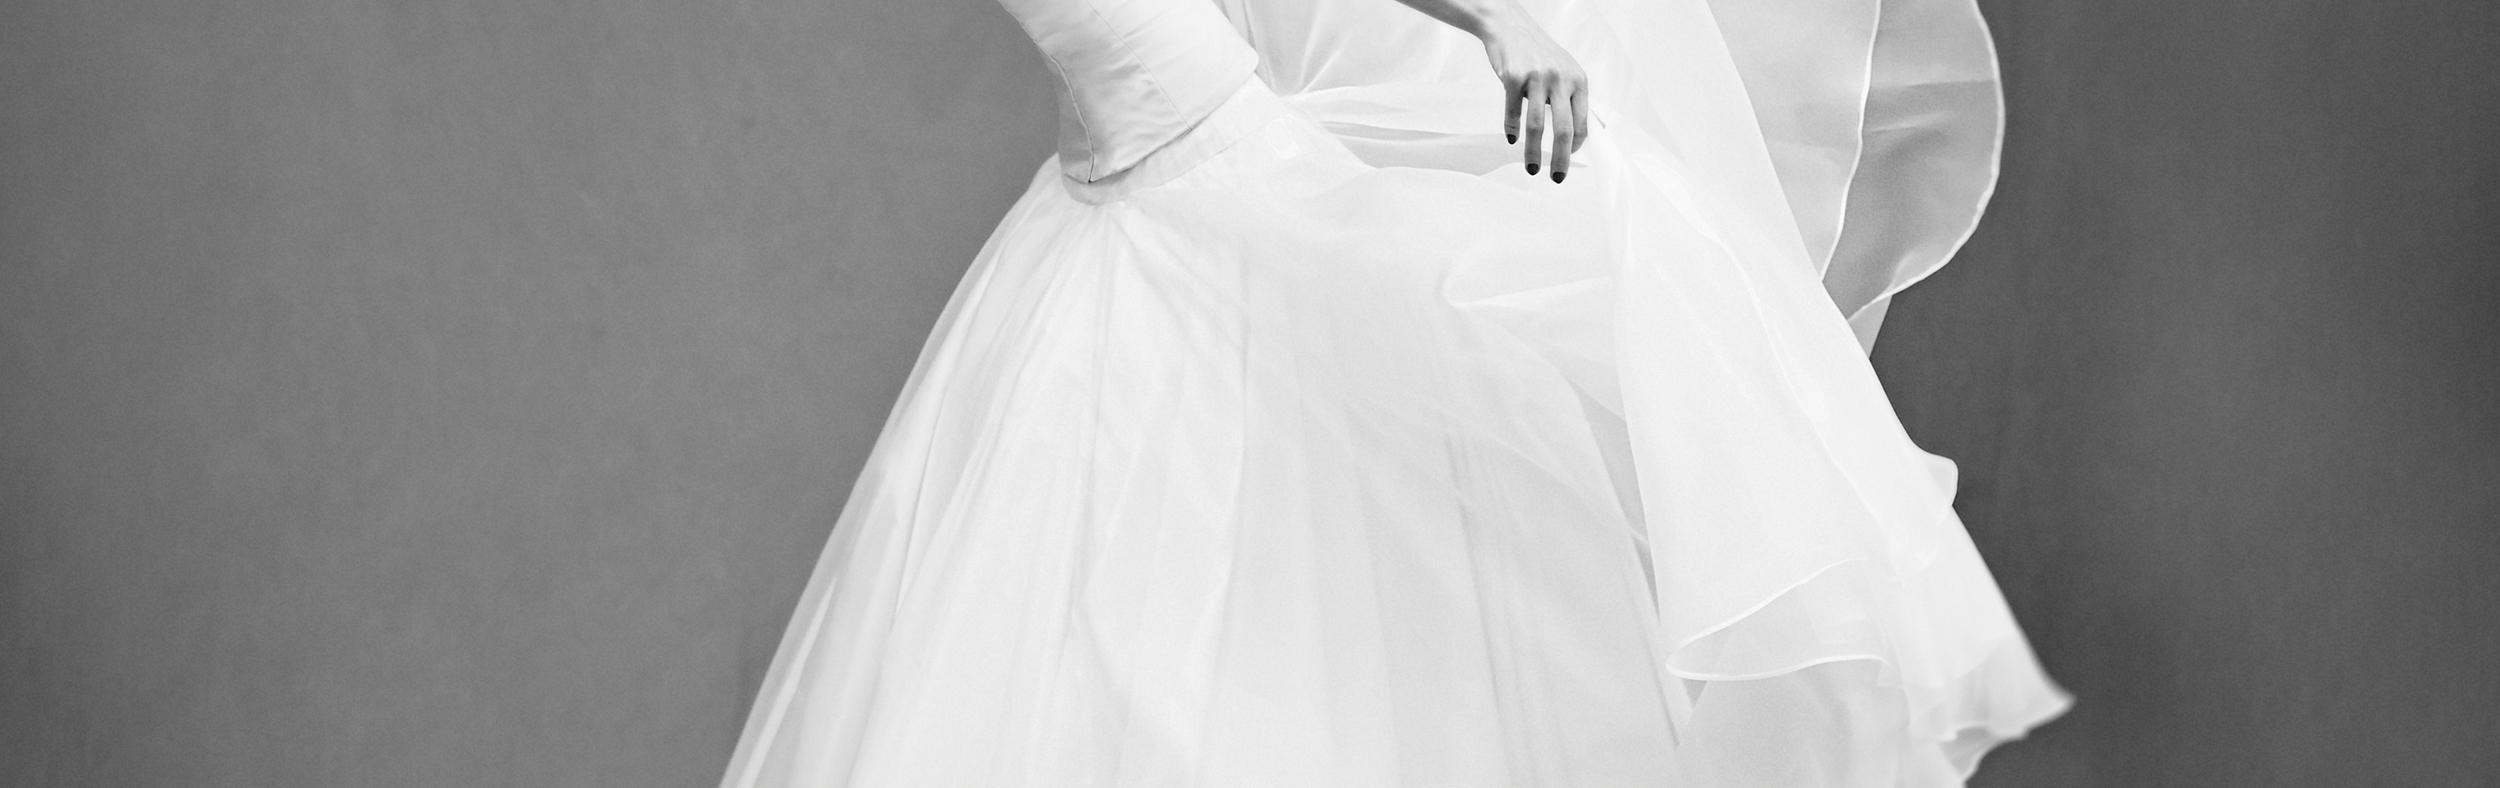 Jill Andrews Gowns